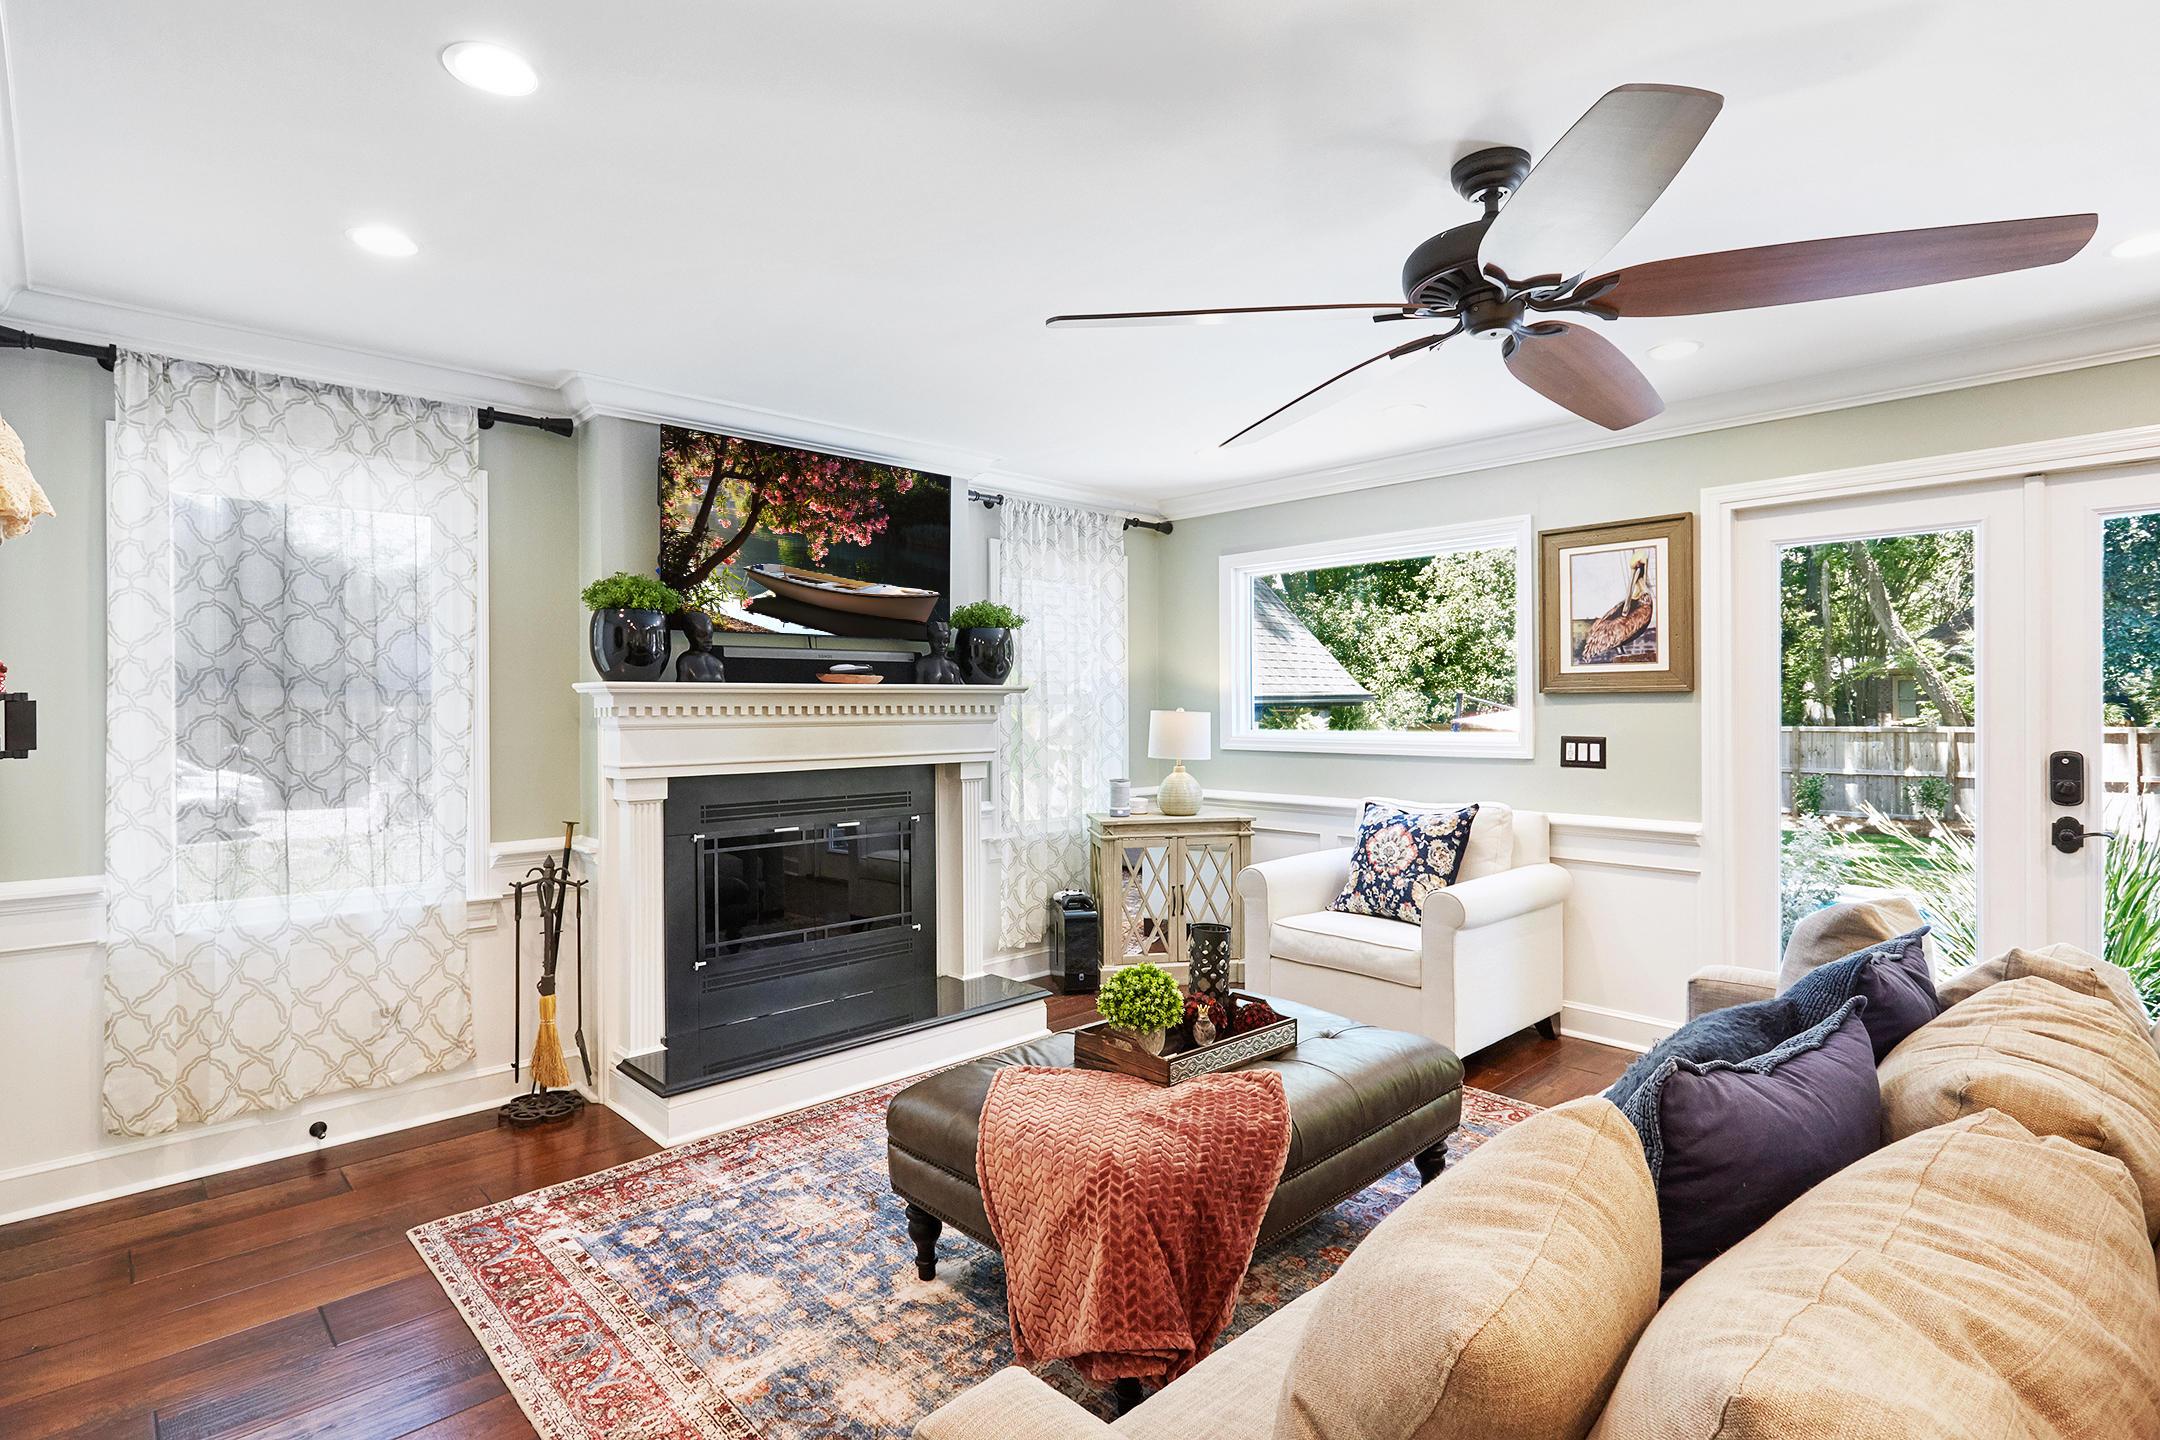 Stiles Point Plantation Homes For Sale - 699 Castle Pinckney, Charleston, SC - 29